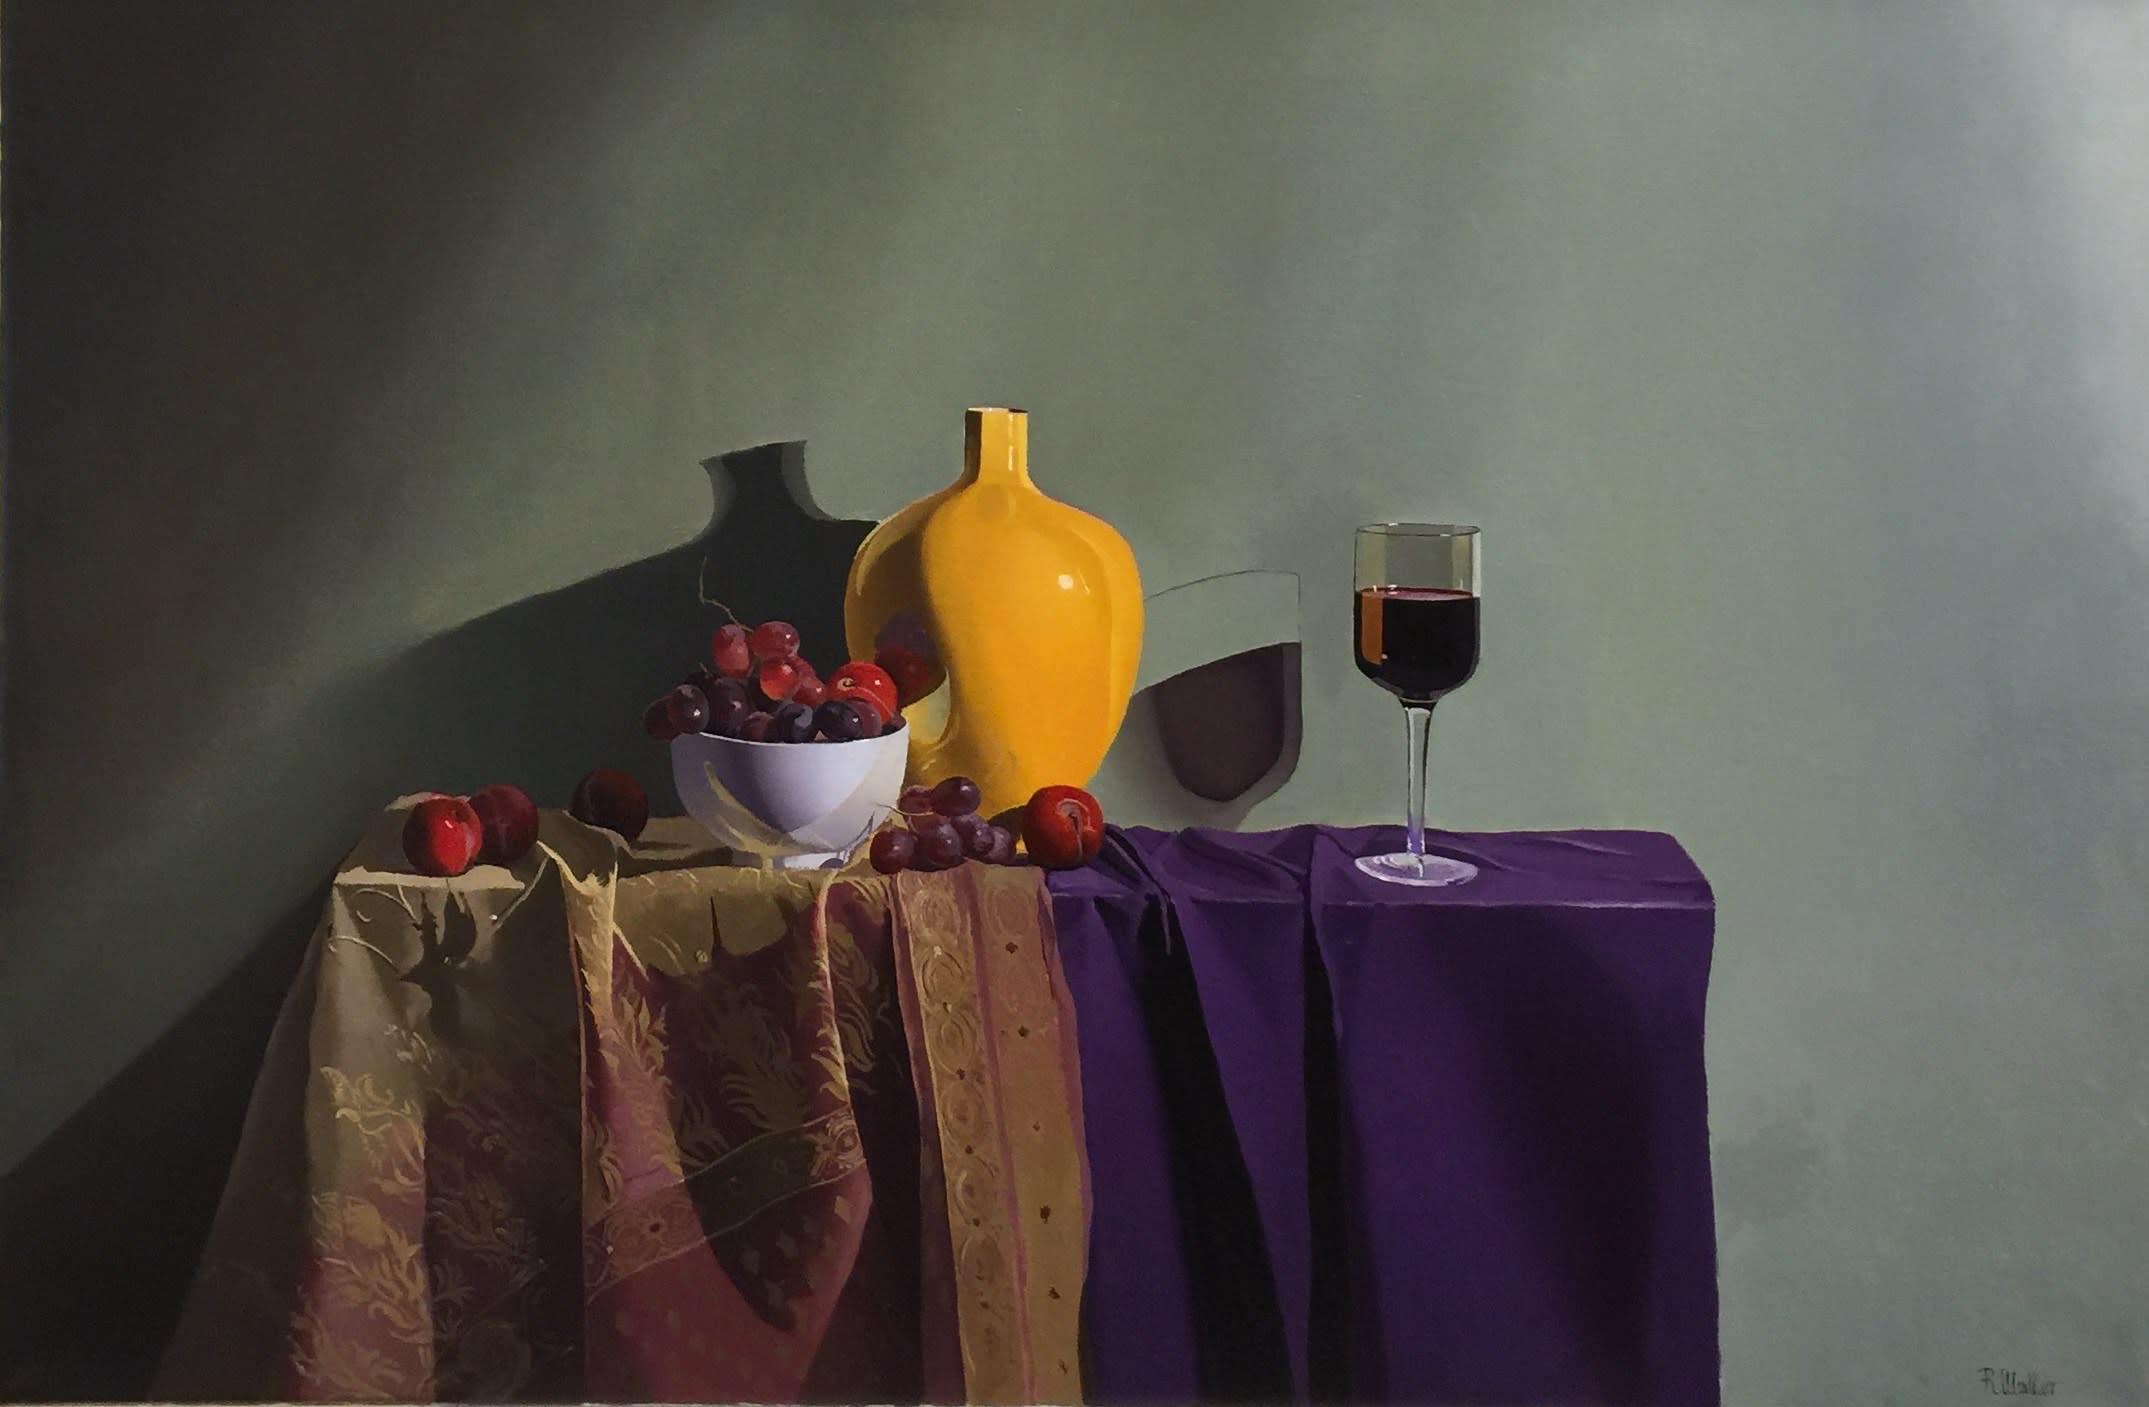 <span class=&#34;link fancybox-details-link&#34;><a href=&#34;/artists/67-robert-walker/works/1999-robert-walker-mustard-vase-grapes-and-wine-in-hong-kong/&#34;>View Detail Page</a></span><div class=&#34;artist&#34;><strong>Robert Walker</strong></div> <div class=&#34;title&#34;><em>Mustard Vase, Grapes and Wine</em>, In Hong Kong</div> <div class=&#34;medium&#34;>Oil on Linen </div> <div class=&#34;dimensions&#34;>53 x 78 cm</div><div class=&#34;price&#34;>HK$25,000.00</div><div class=&#34;copyright_line&#34;>Copyright The Artist</div>